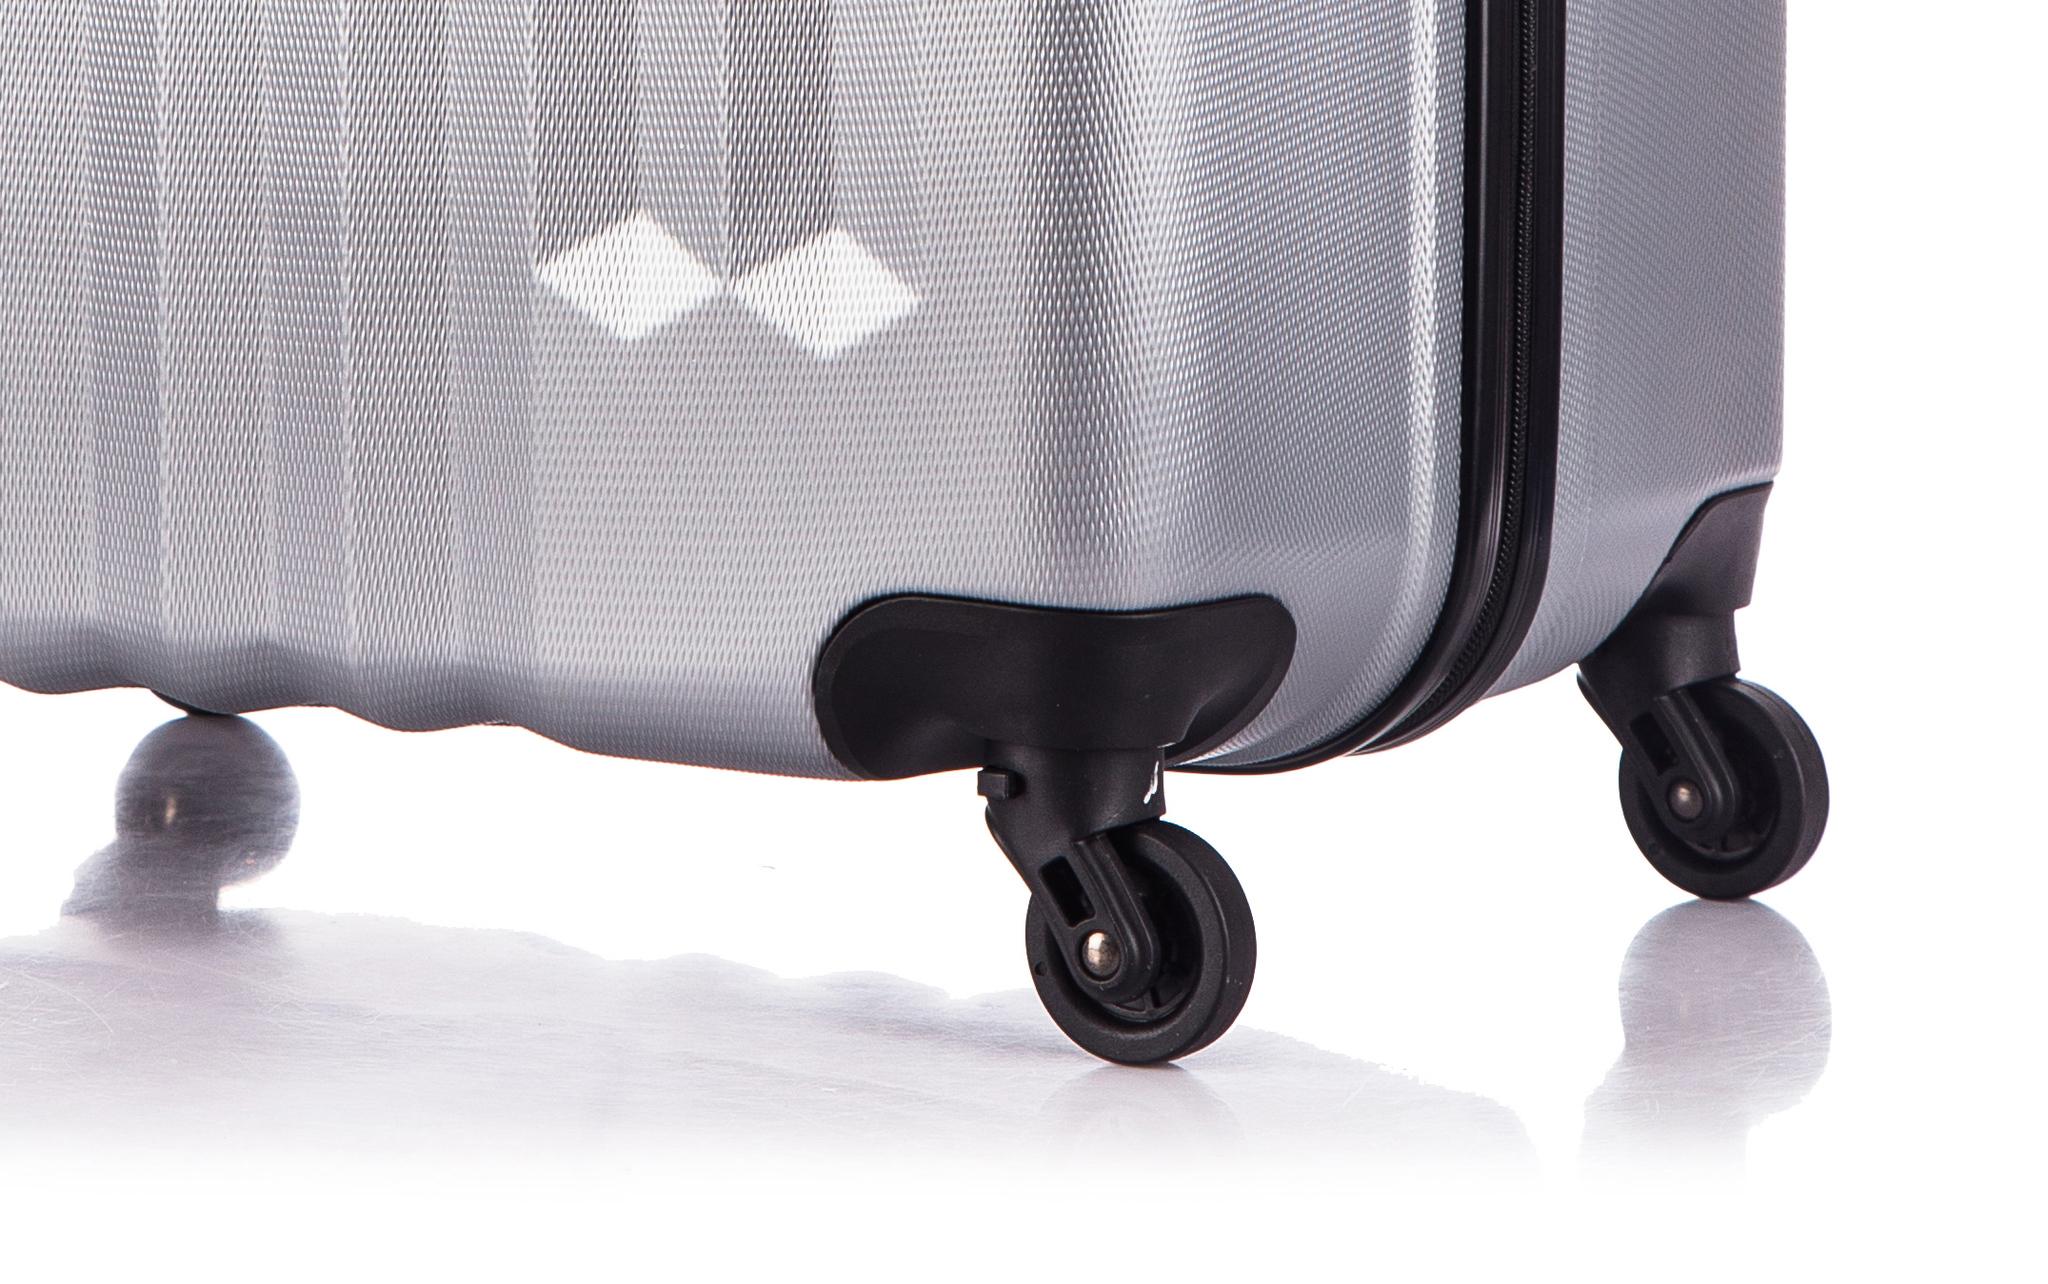 Чемодан со съемными колесами L'case Phuket-28 Серебро (L)